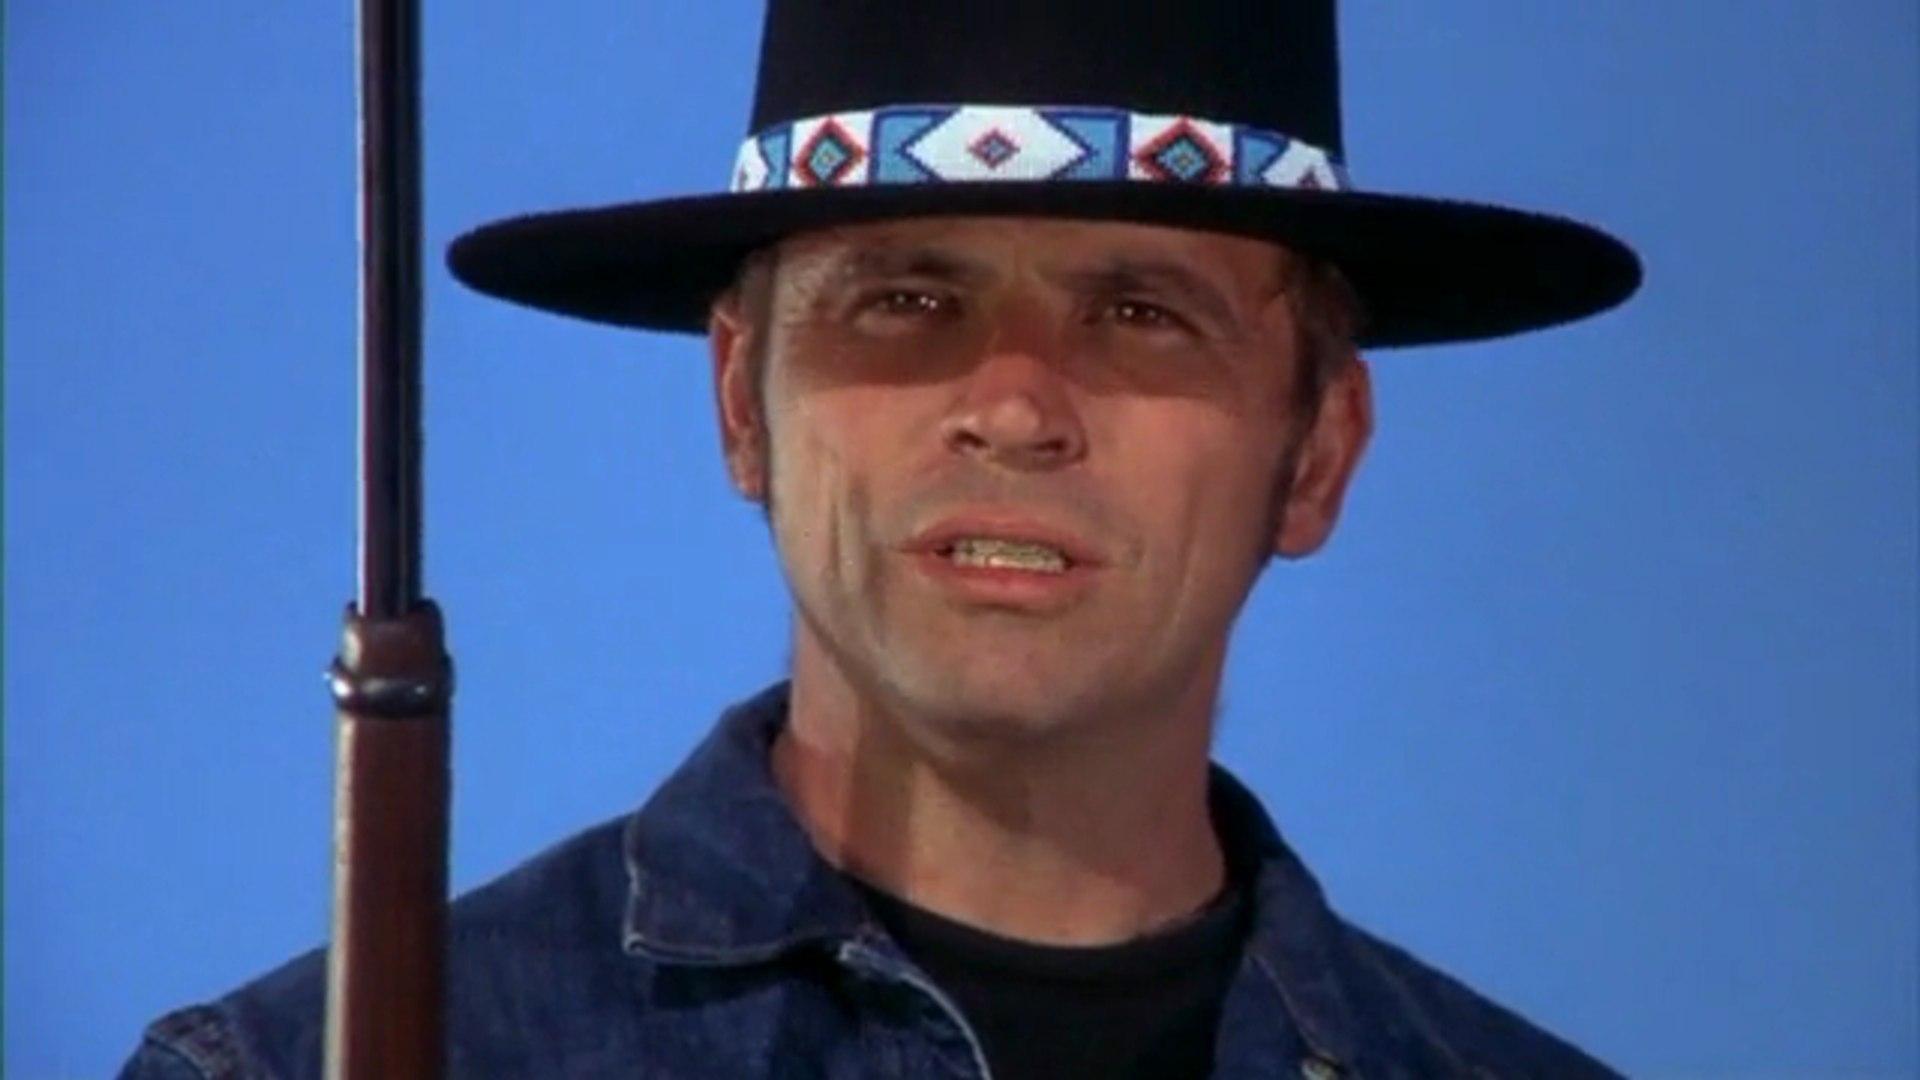 Billy Jack (1971) –  Action, Drama, Western